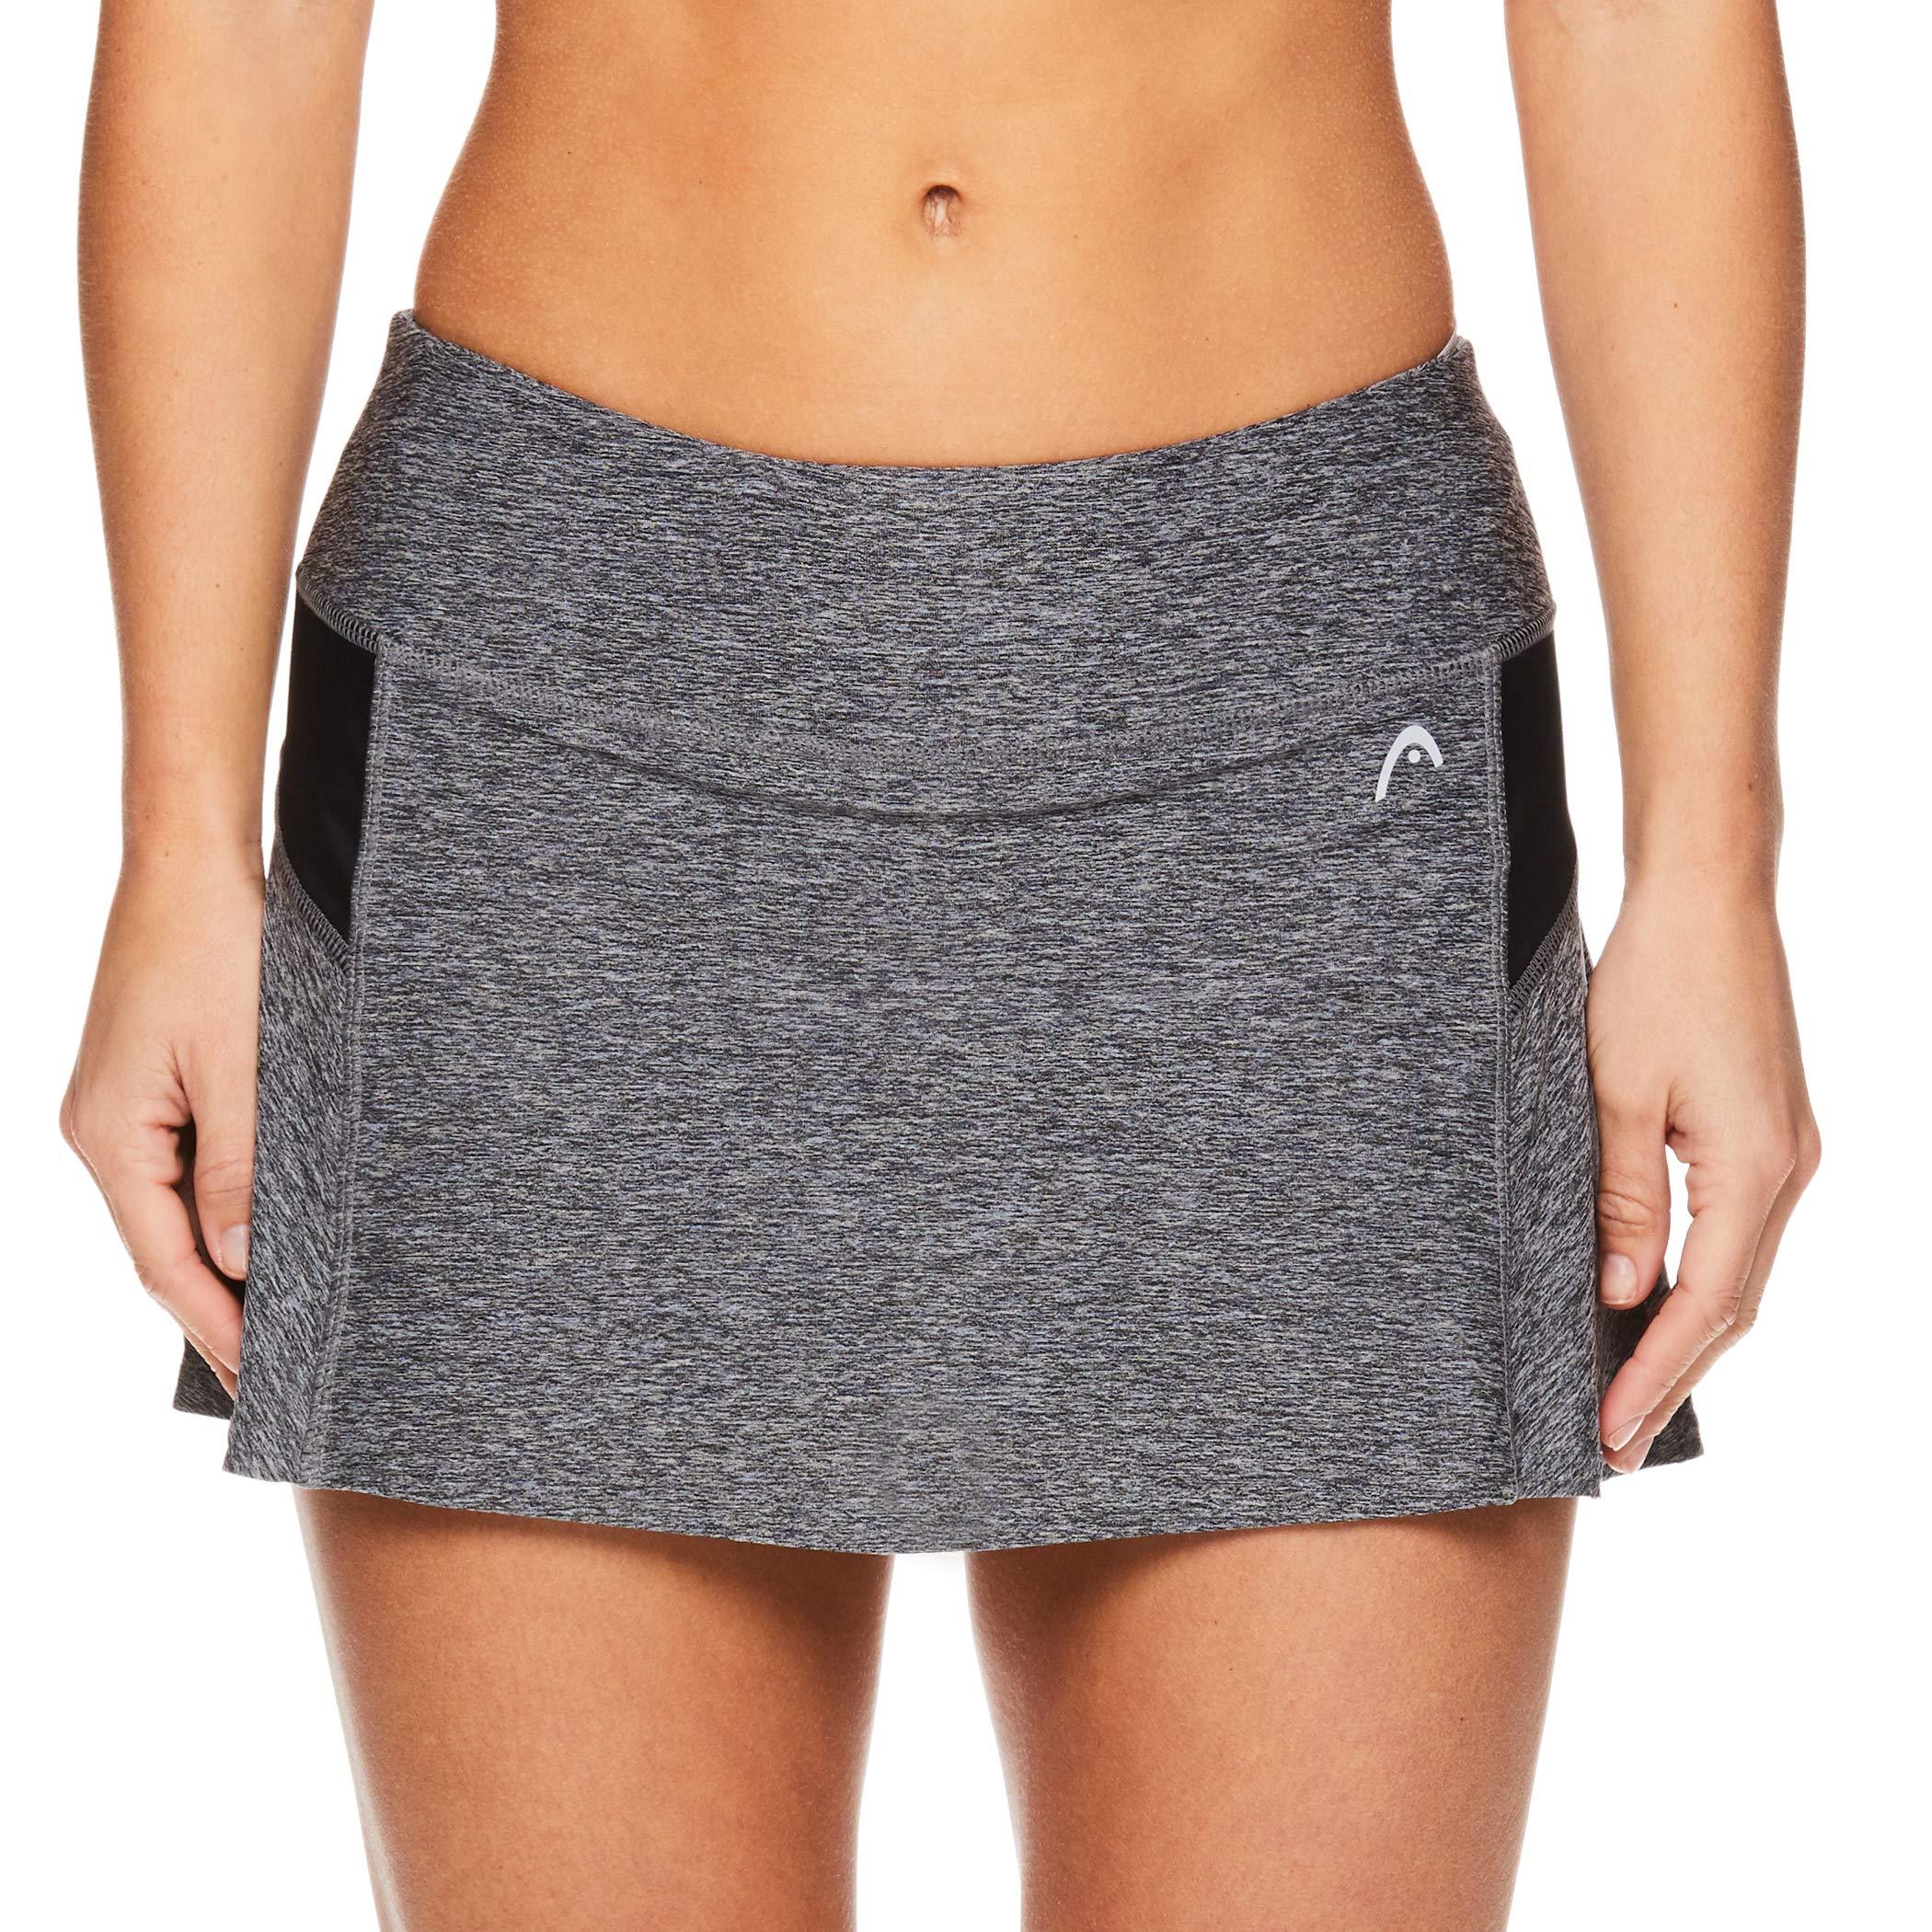 HEAD Women's Athletic Tennis Skort - Performance Training & Running Skirt - Black Heather, X-Small